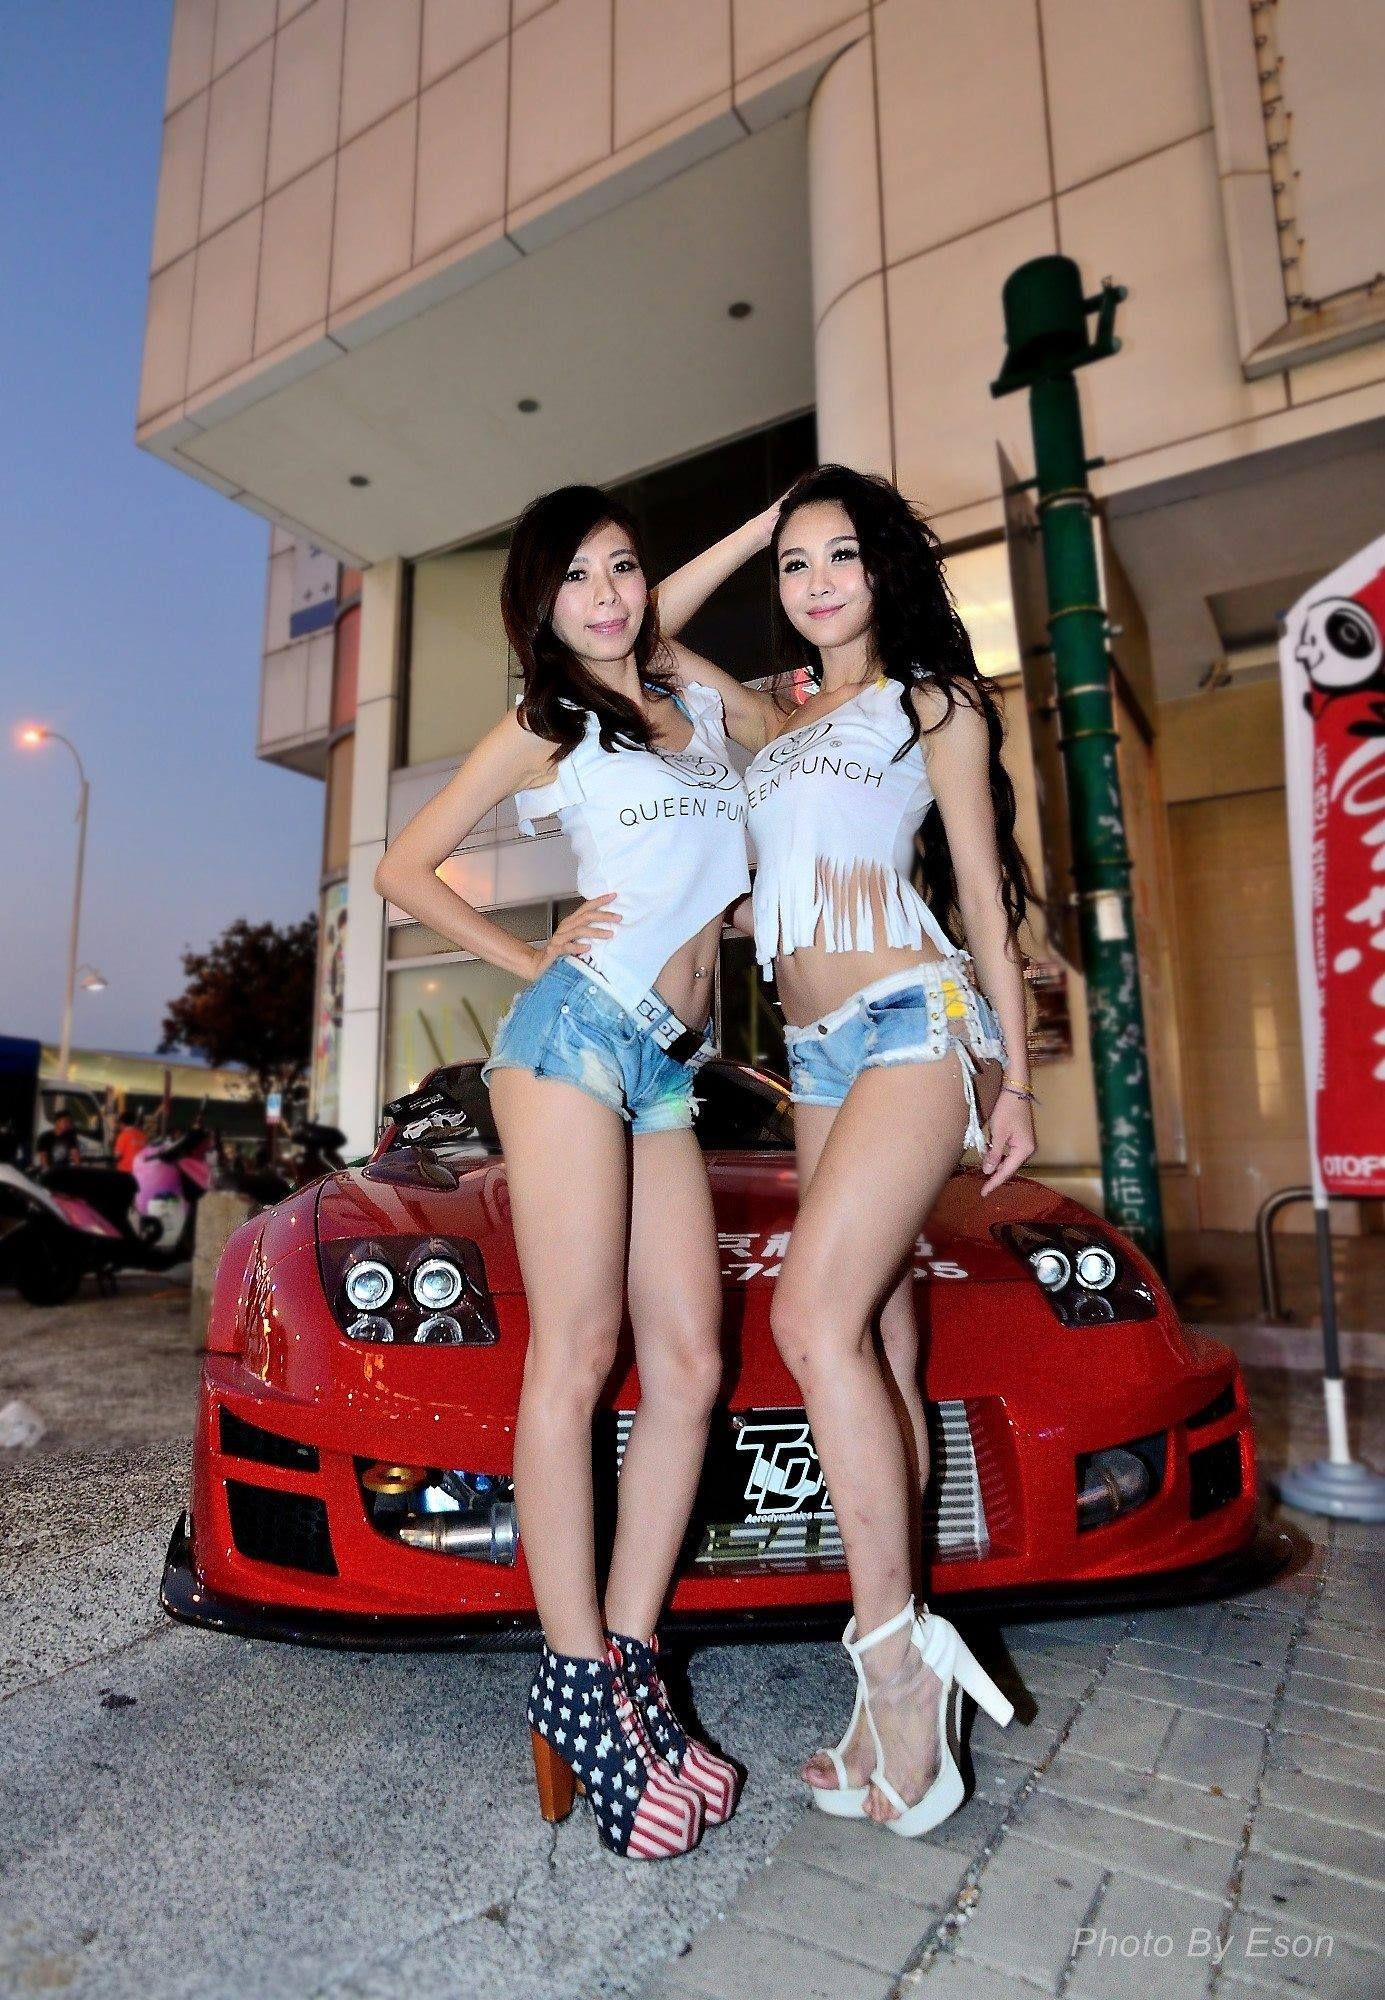 car hot night Asian event import models